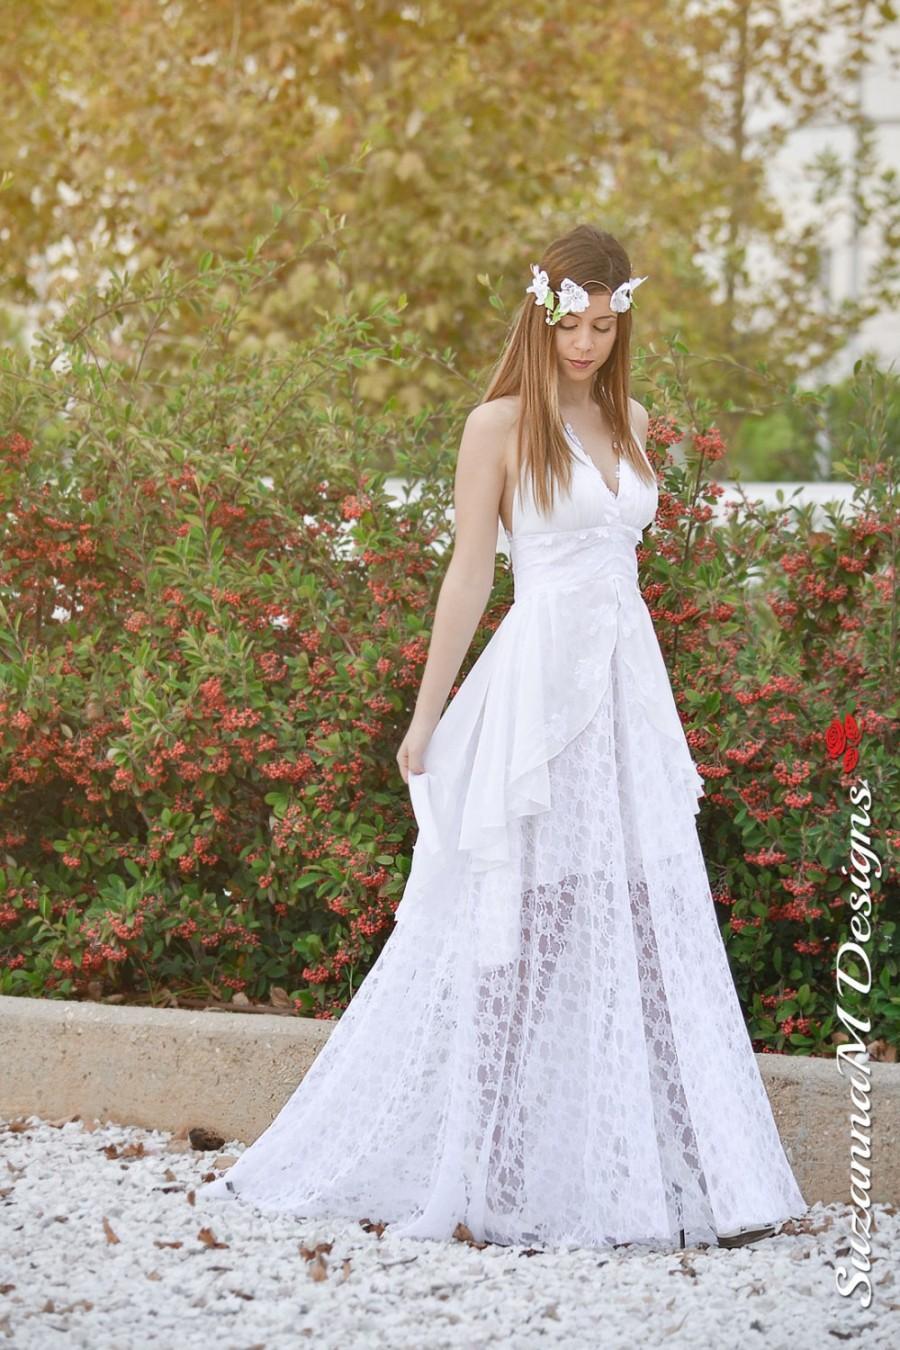 زفاف - Wedding Gown, SuzannaM Designs, Assymetric Wedding Dress, Chiffon Wedding Gown, Long White Gown, Lace Wedding Dress, Open Back Dress, Elise